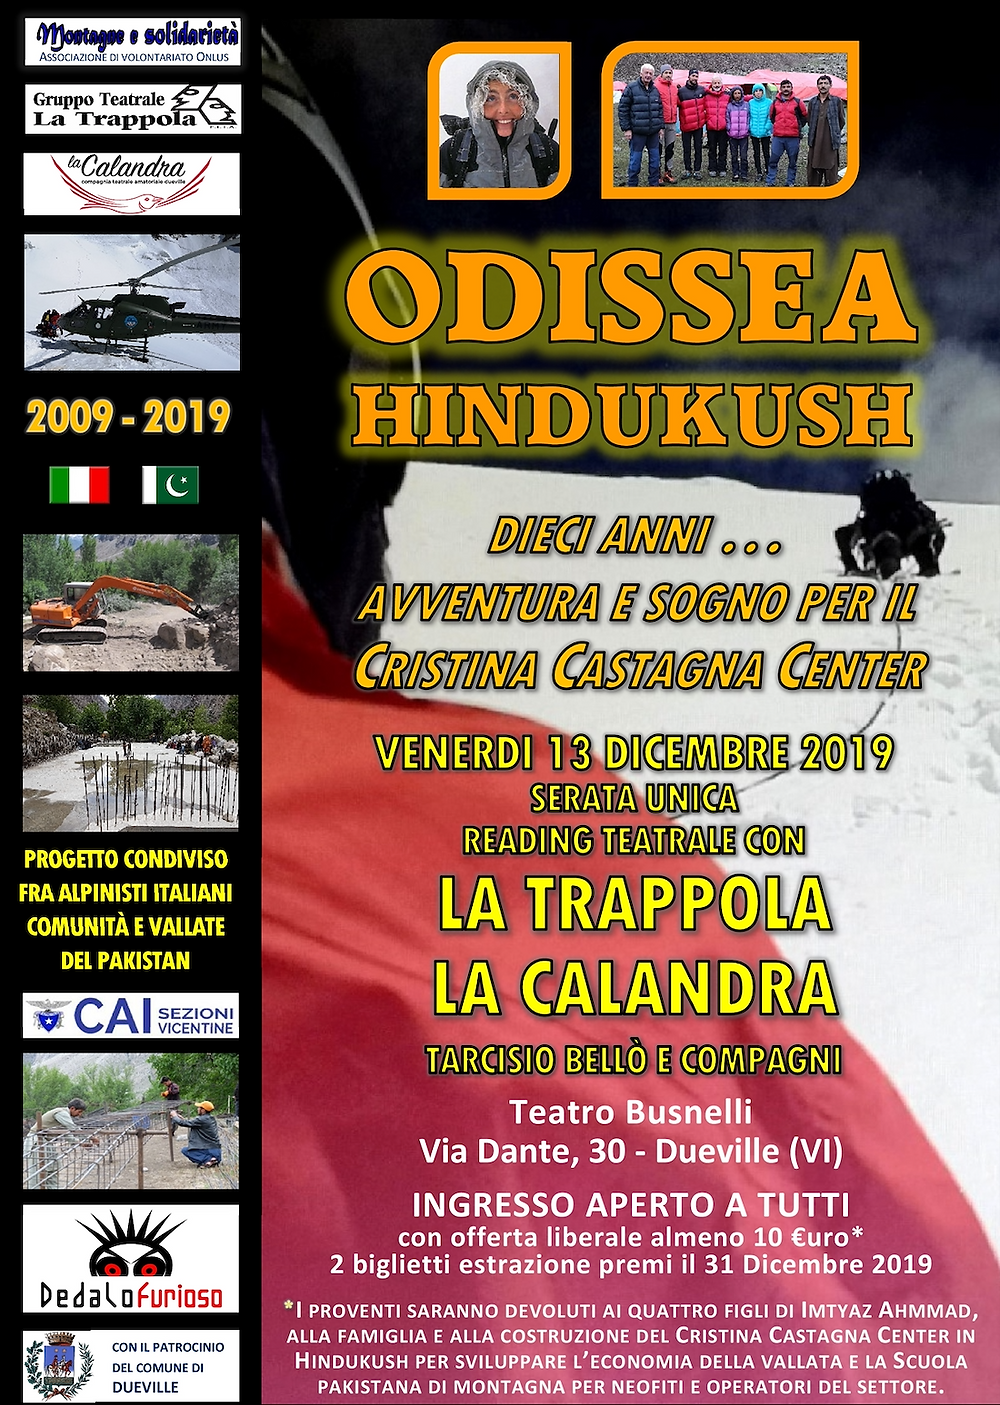 ODISSEA HINDUKUSH